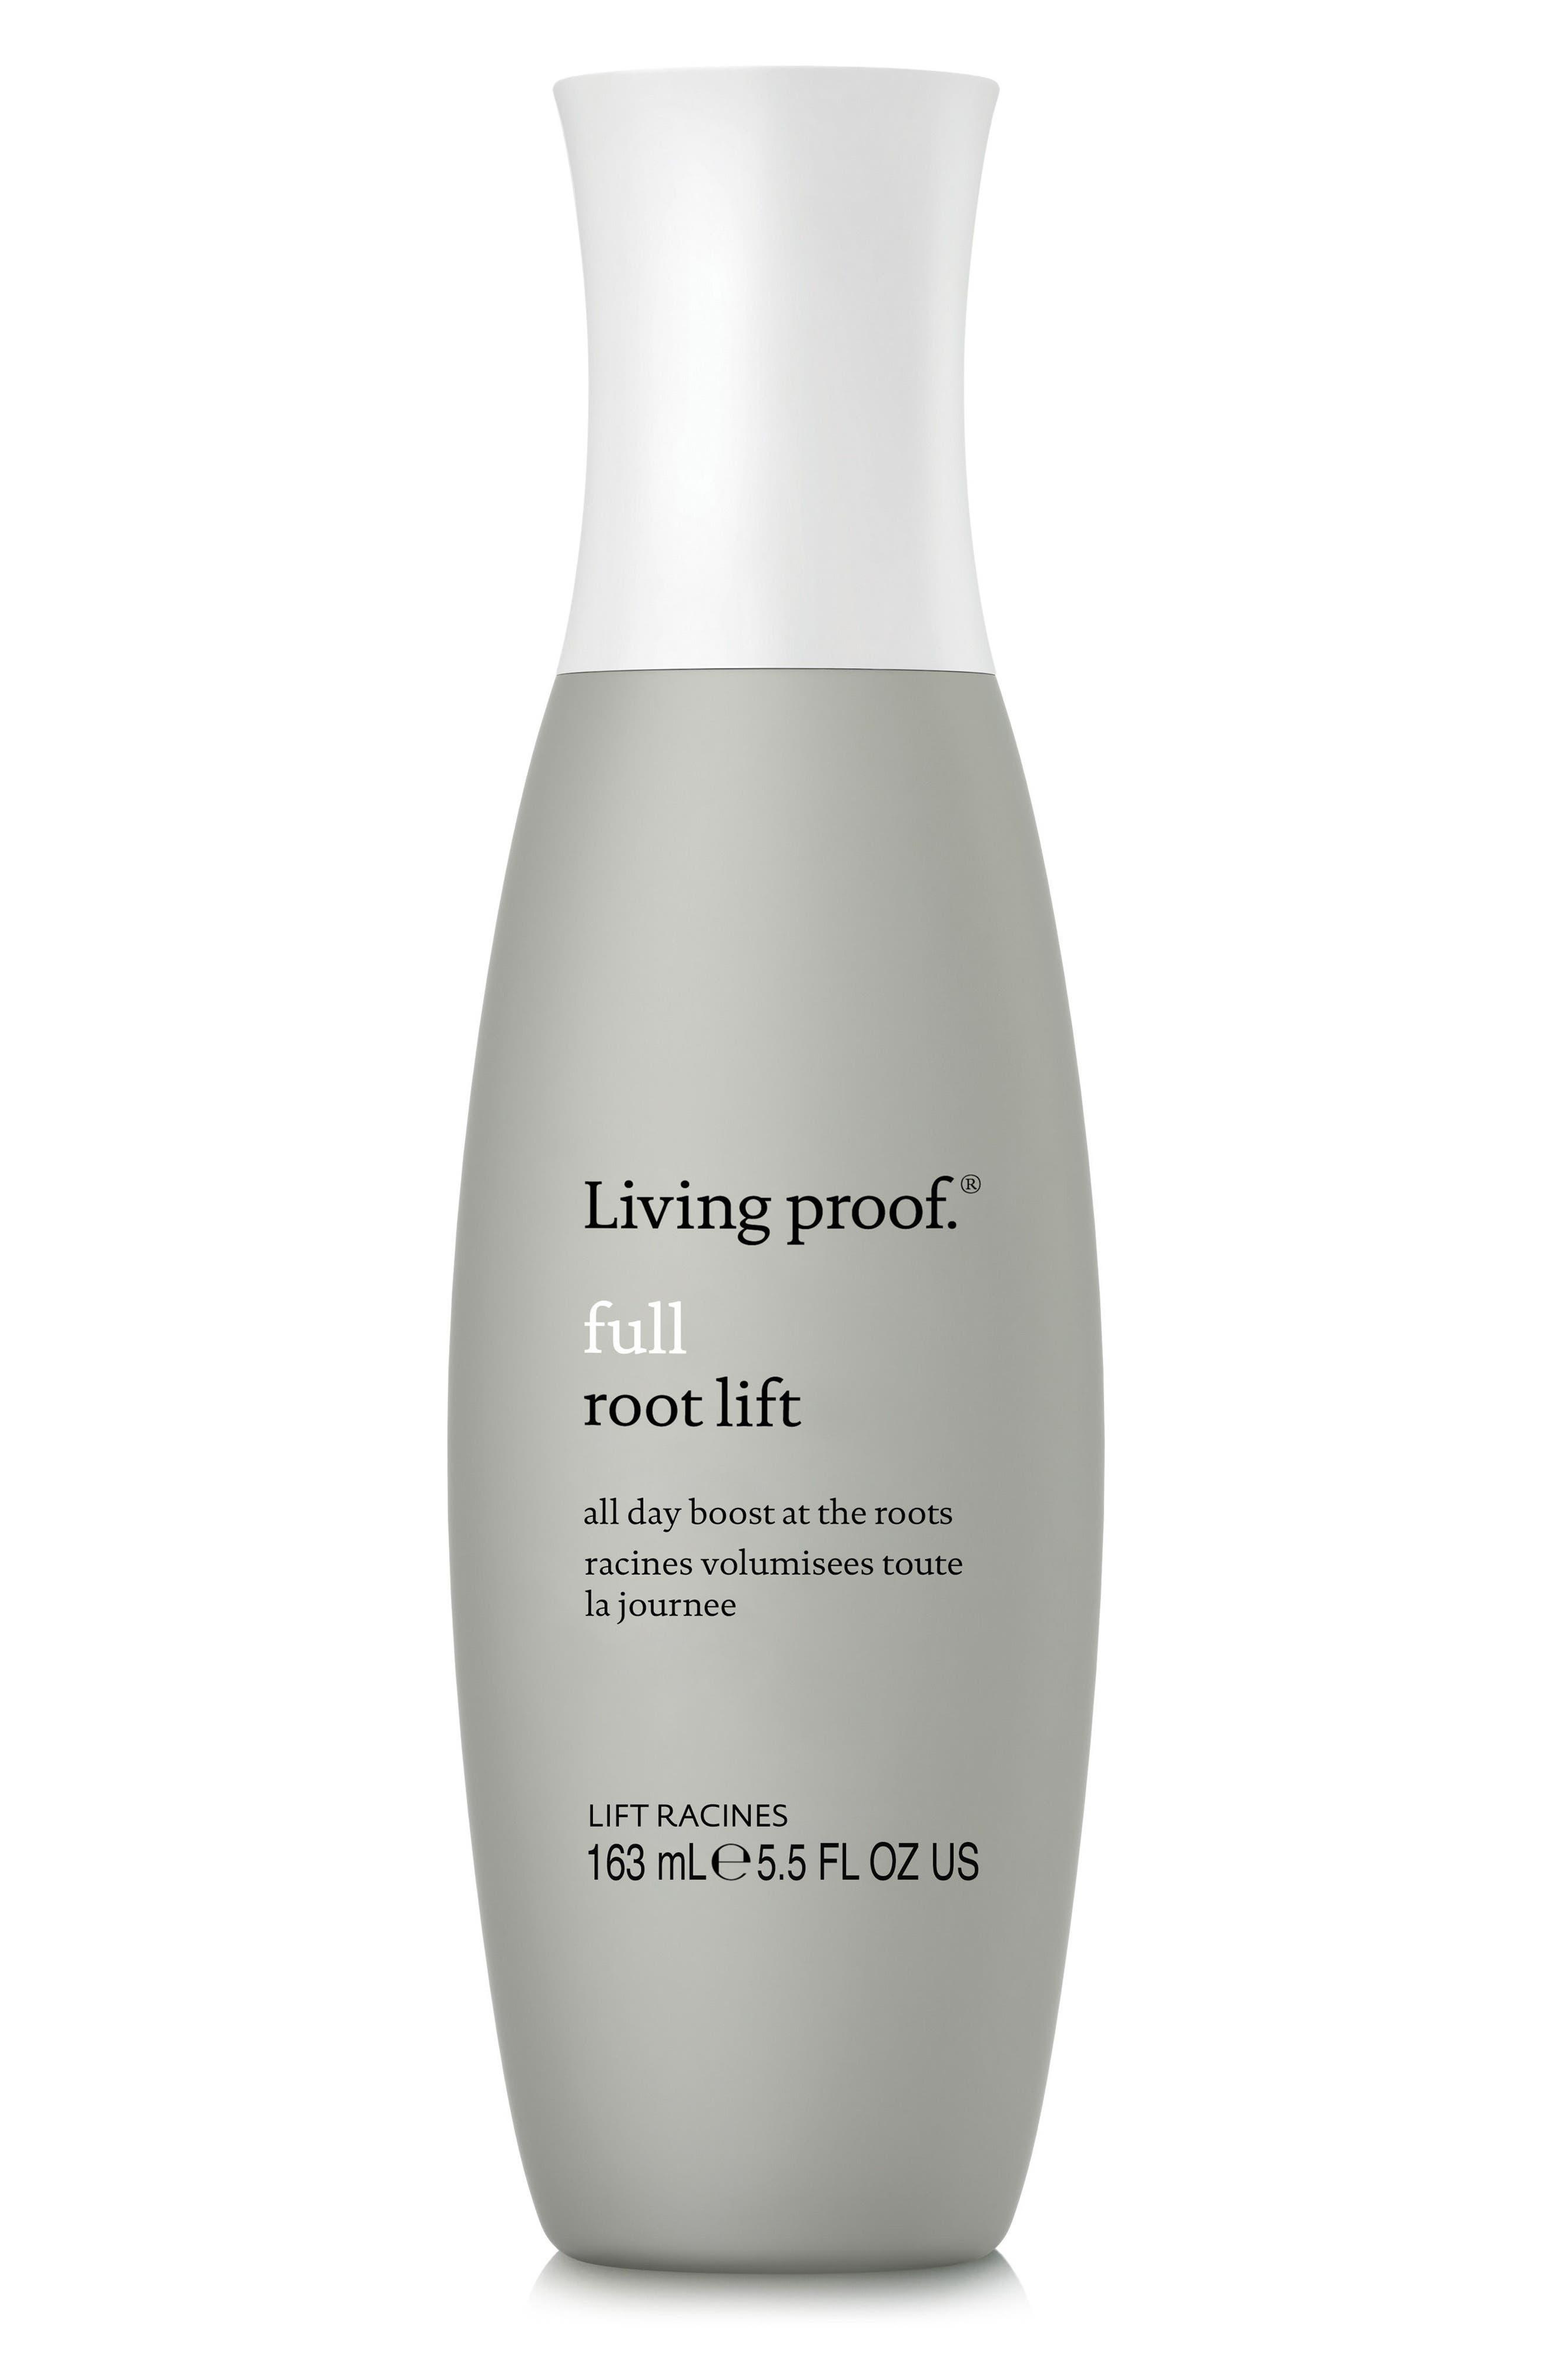 Alternate Image 1 Selected - Living proof® Full Root Lift